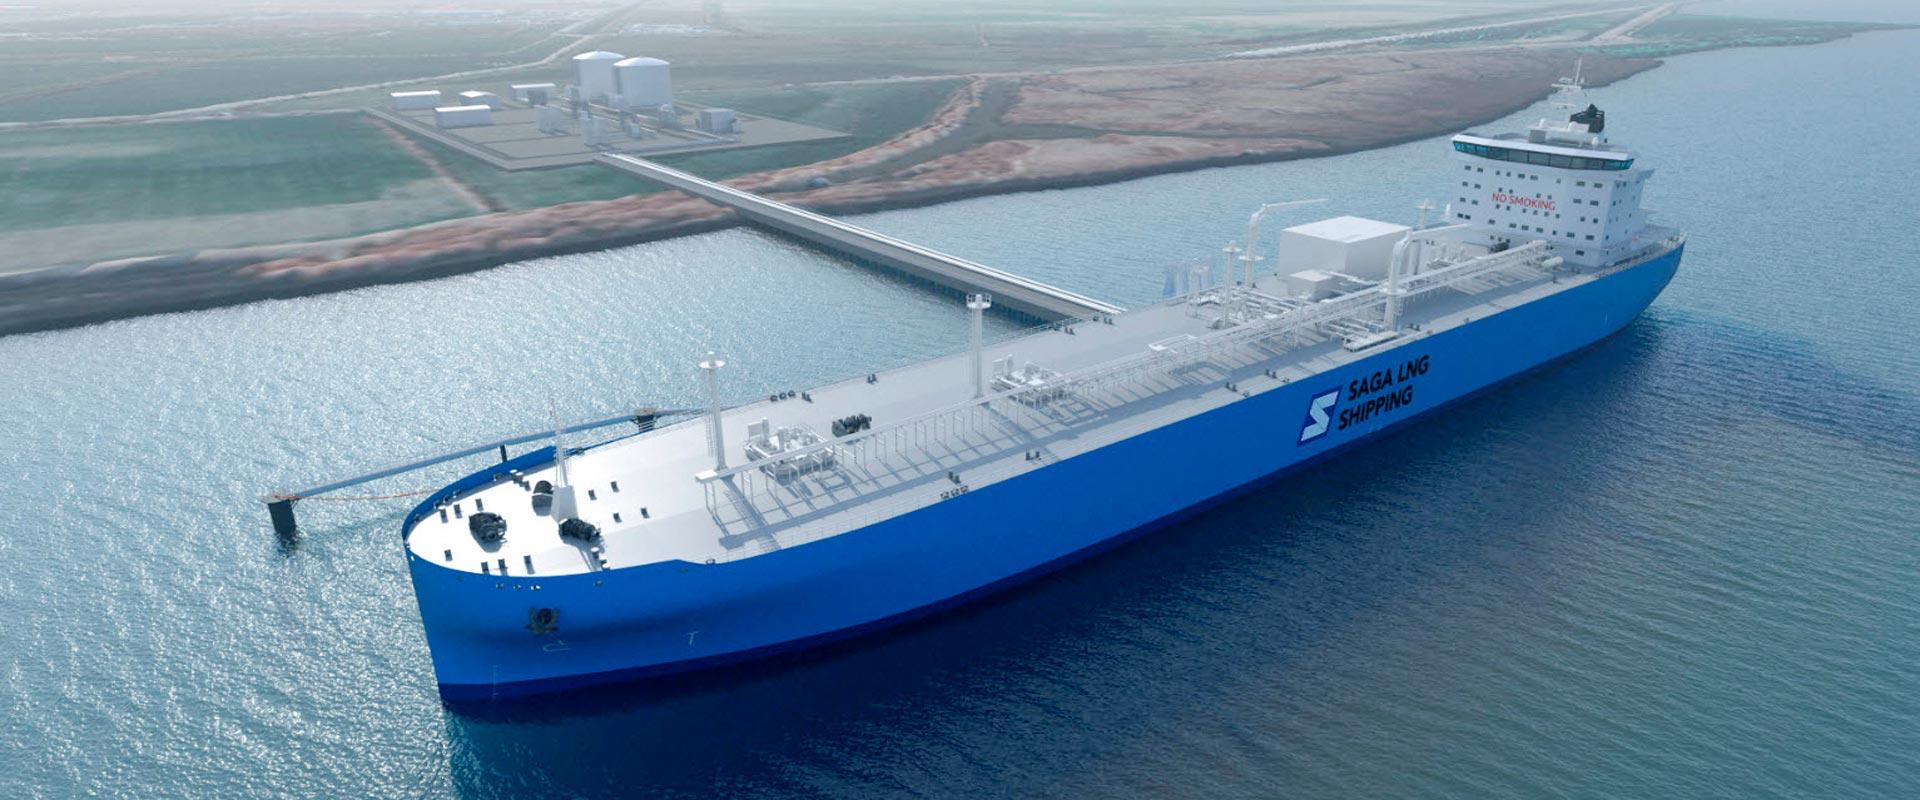 LNT A-BOX containment system Yangtze